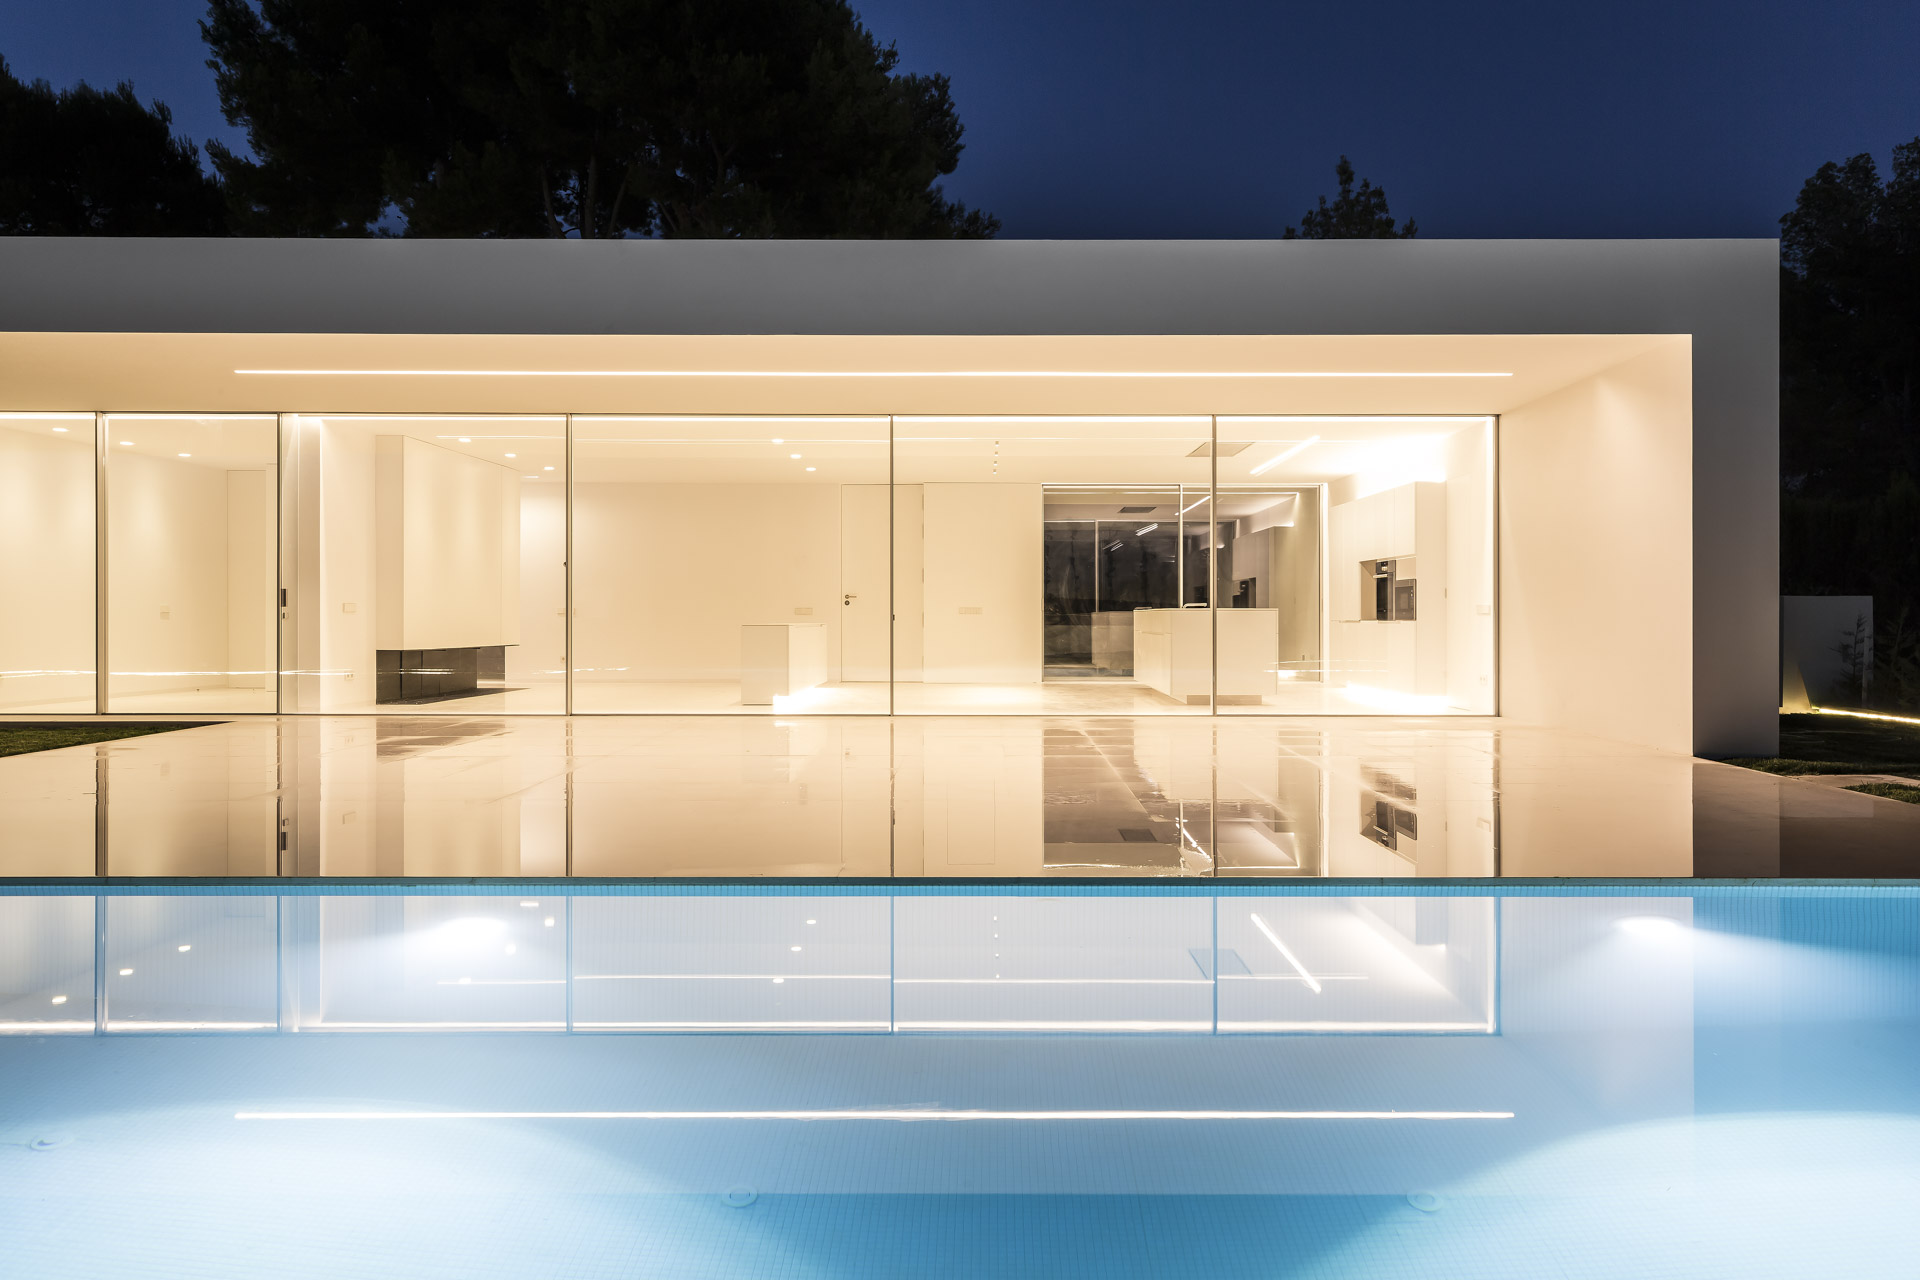 fotografia-arquitectura-valencia-german-cabo-gallardo-llopis-villamarchante-vivienda-64